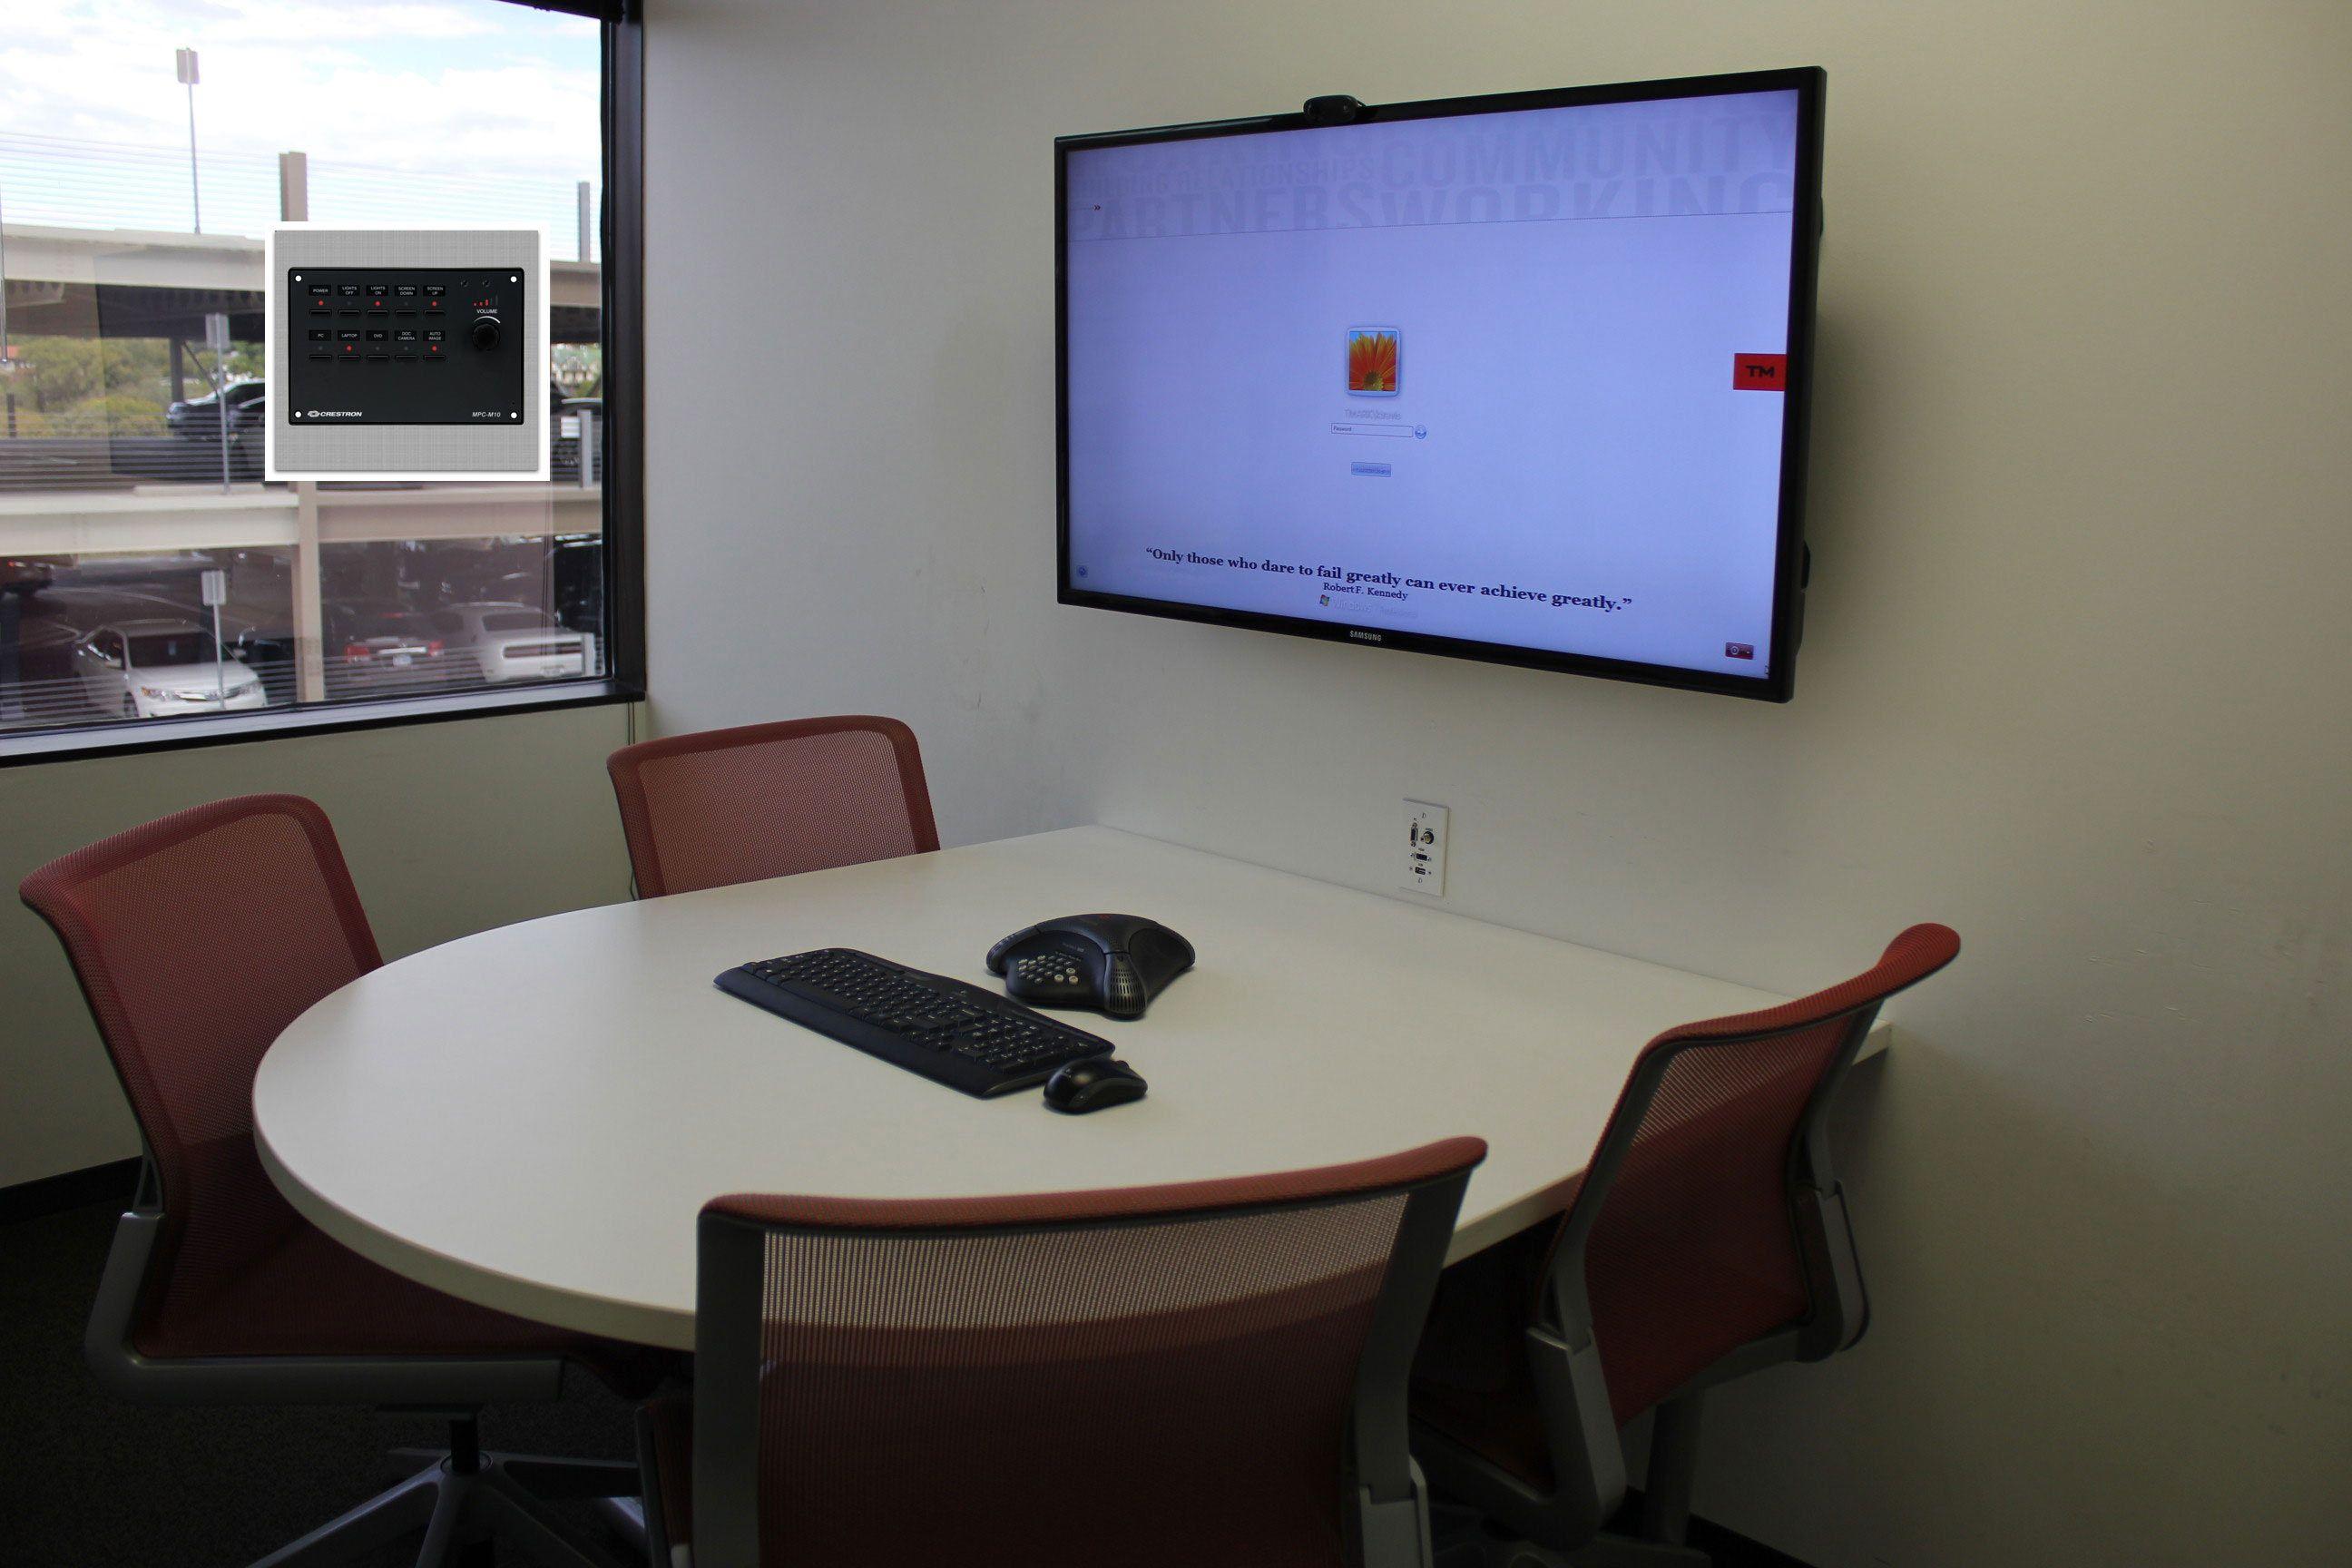 Small Huddle Room Conference Room Design Meeting Room Design Hospital Interior Design